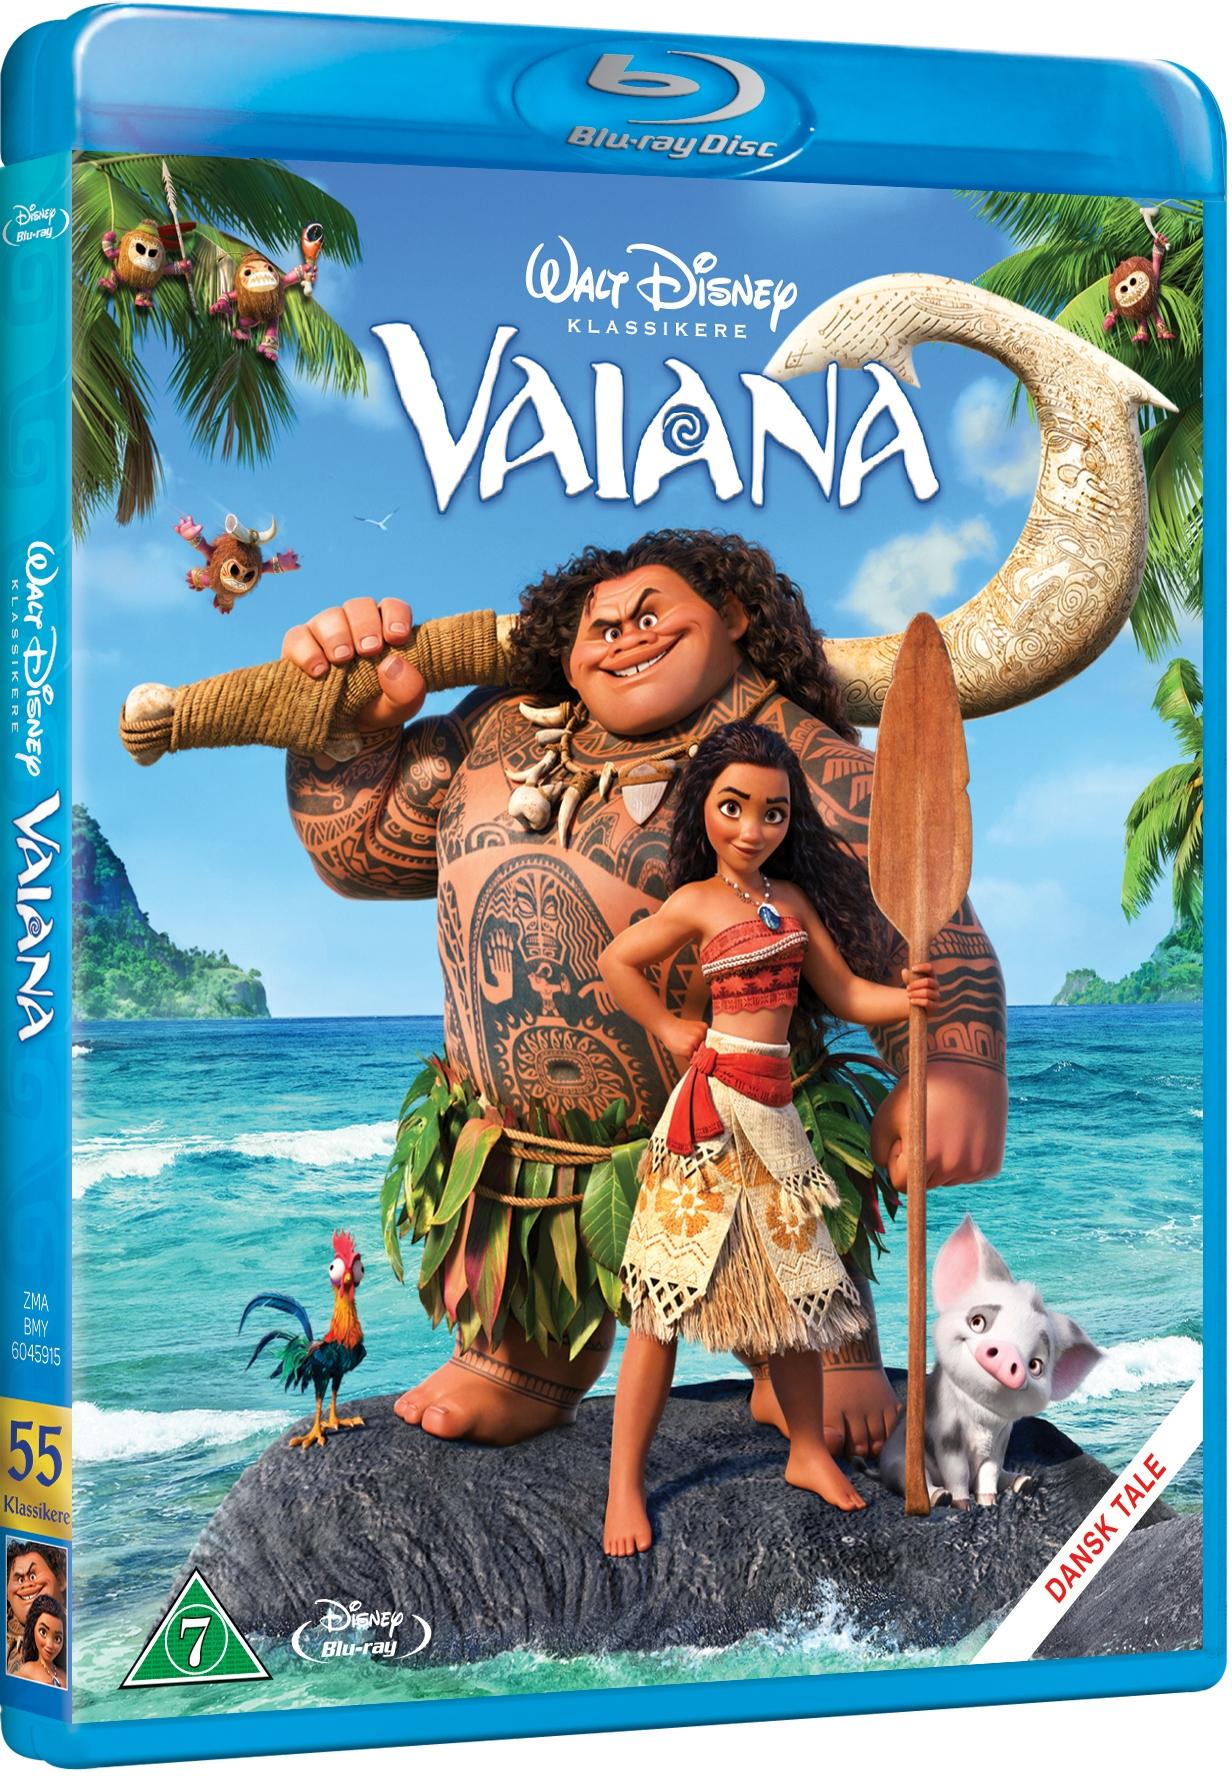 Vaiana -  - Film -  - 8717418496234 - June 15, 2017